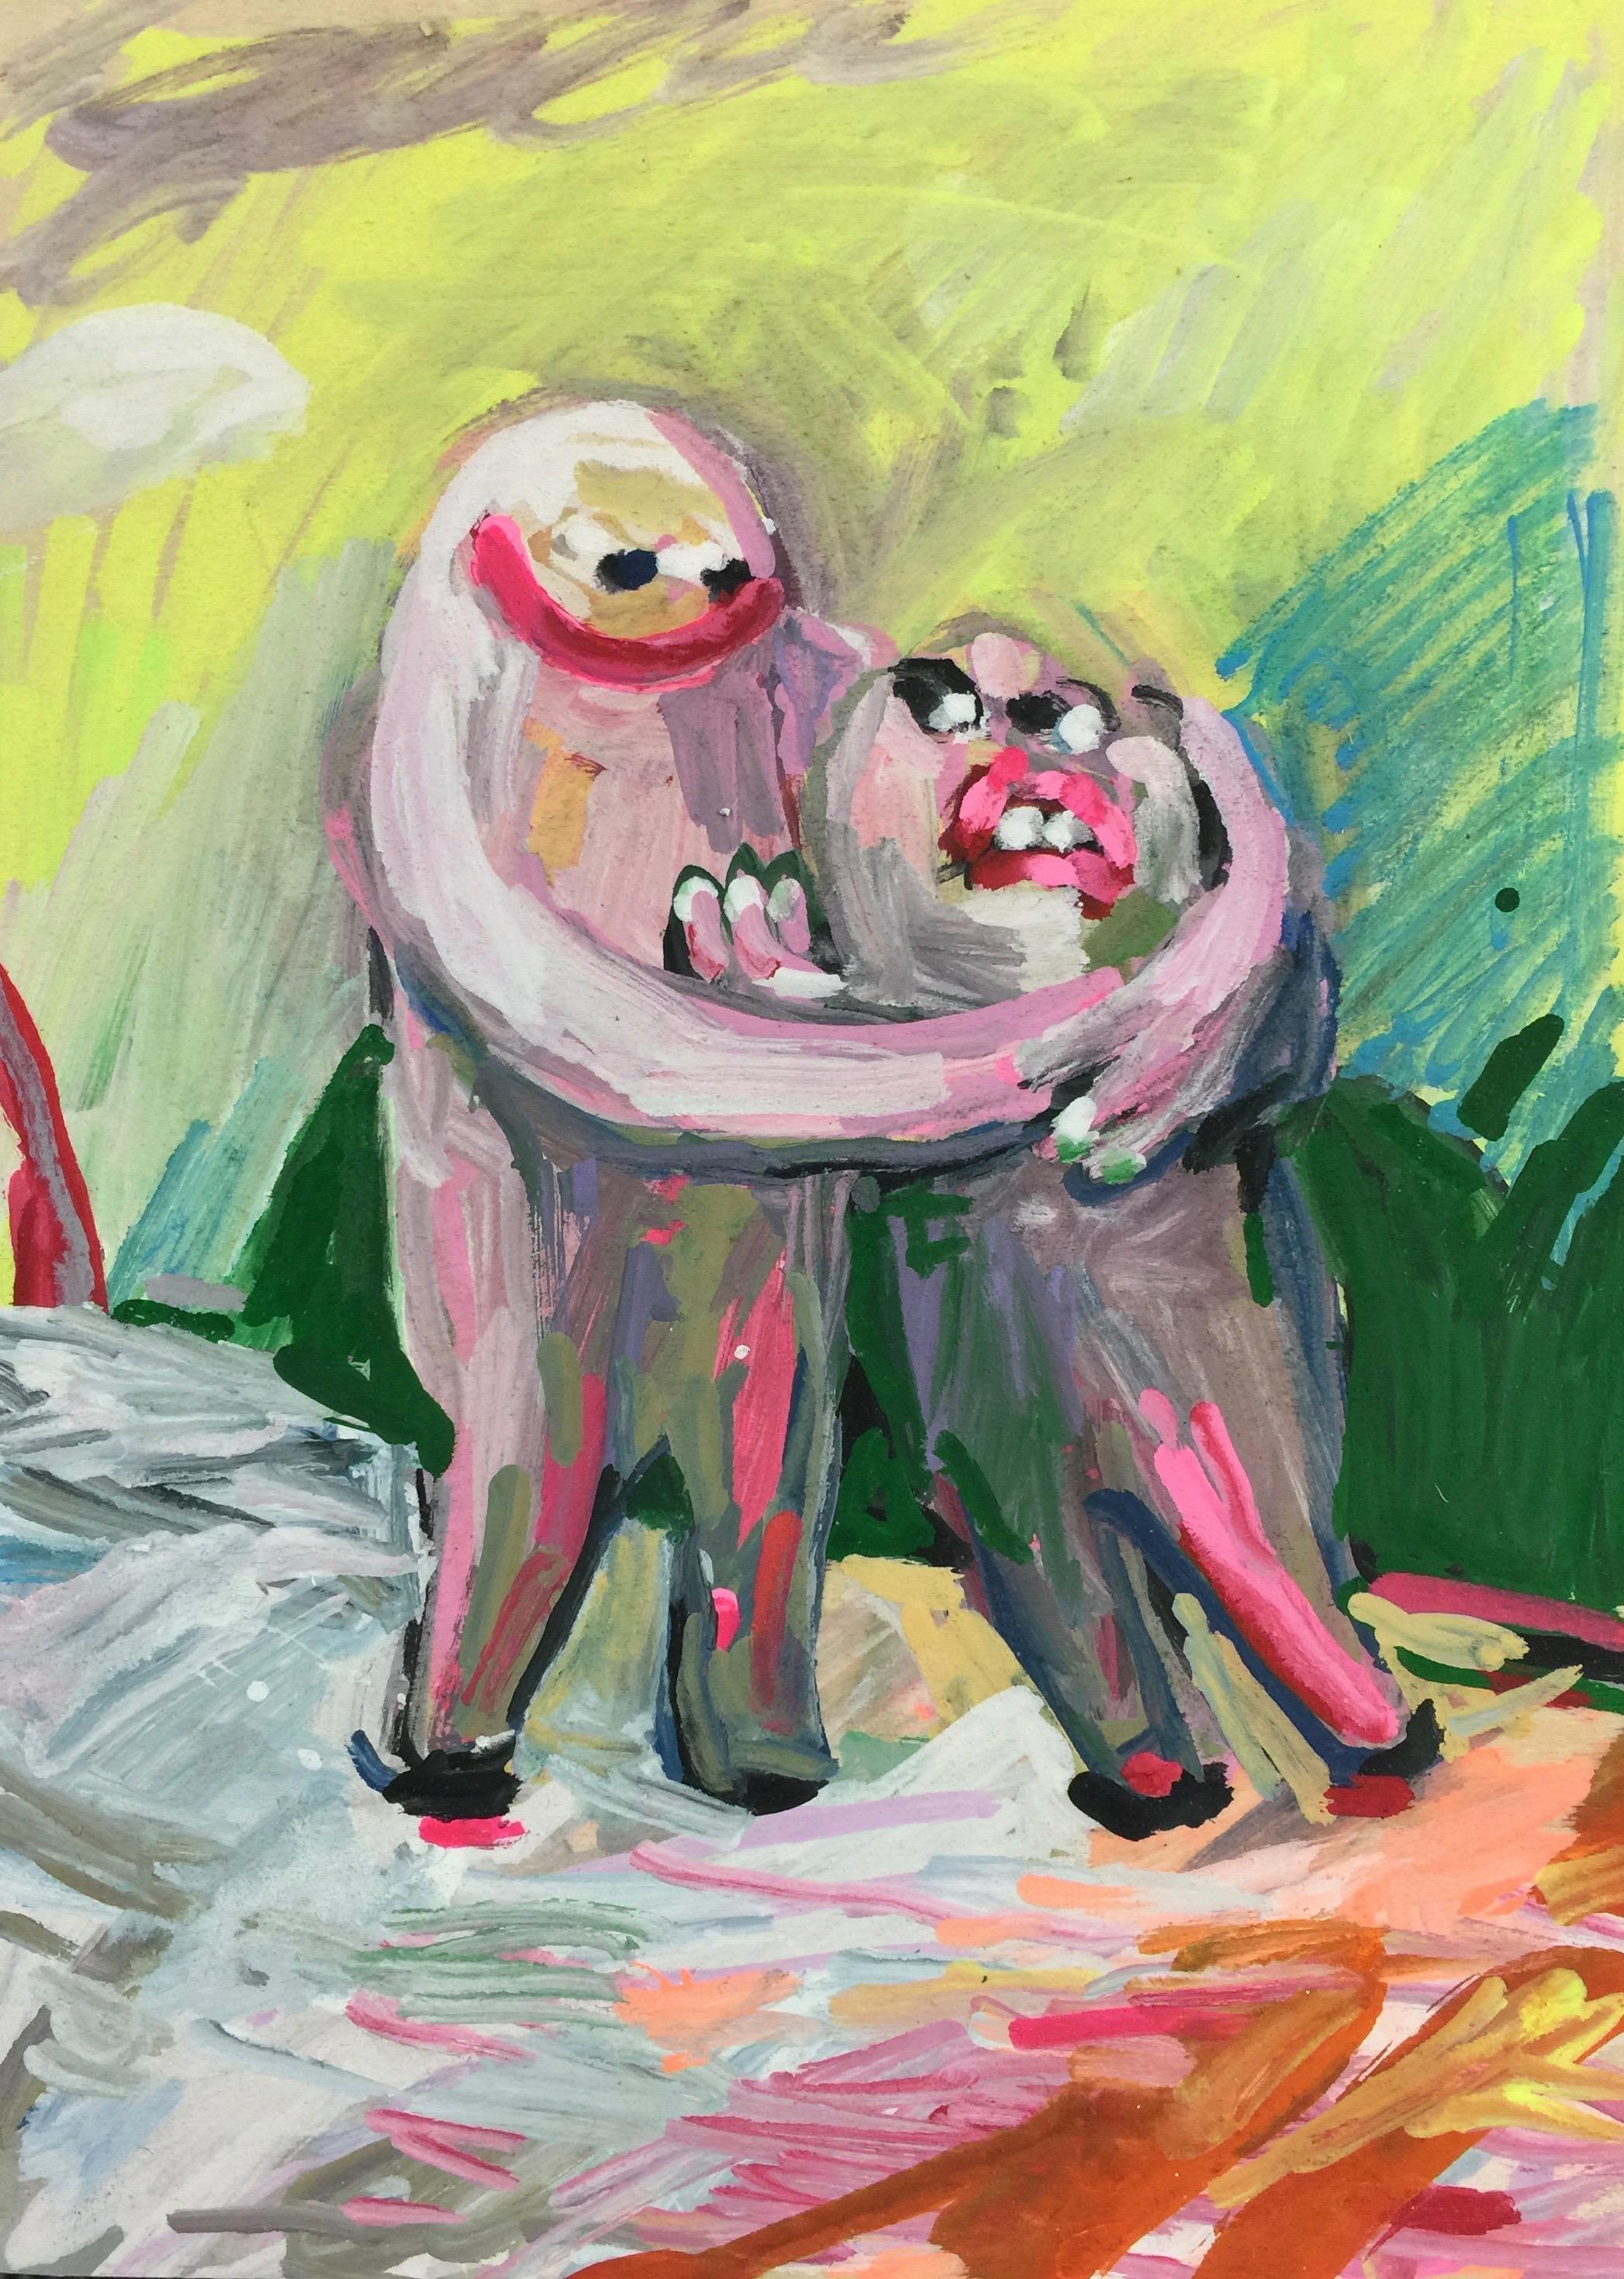 Reluctant Hug